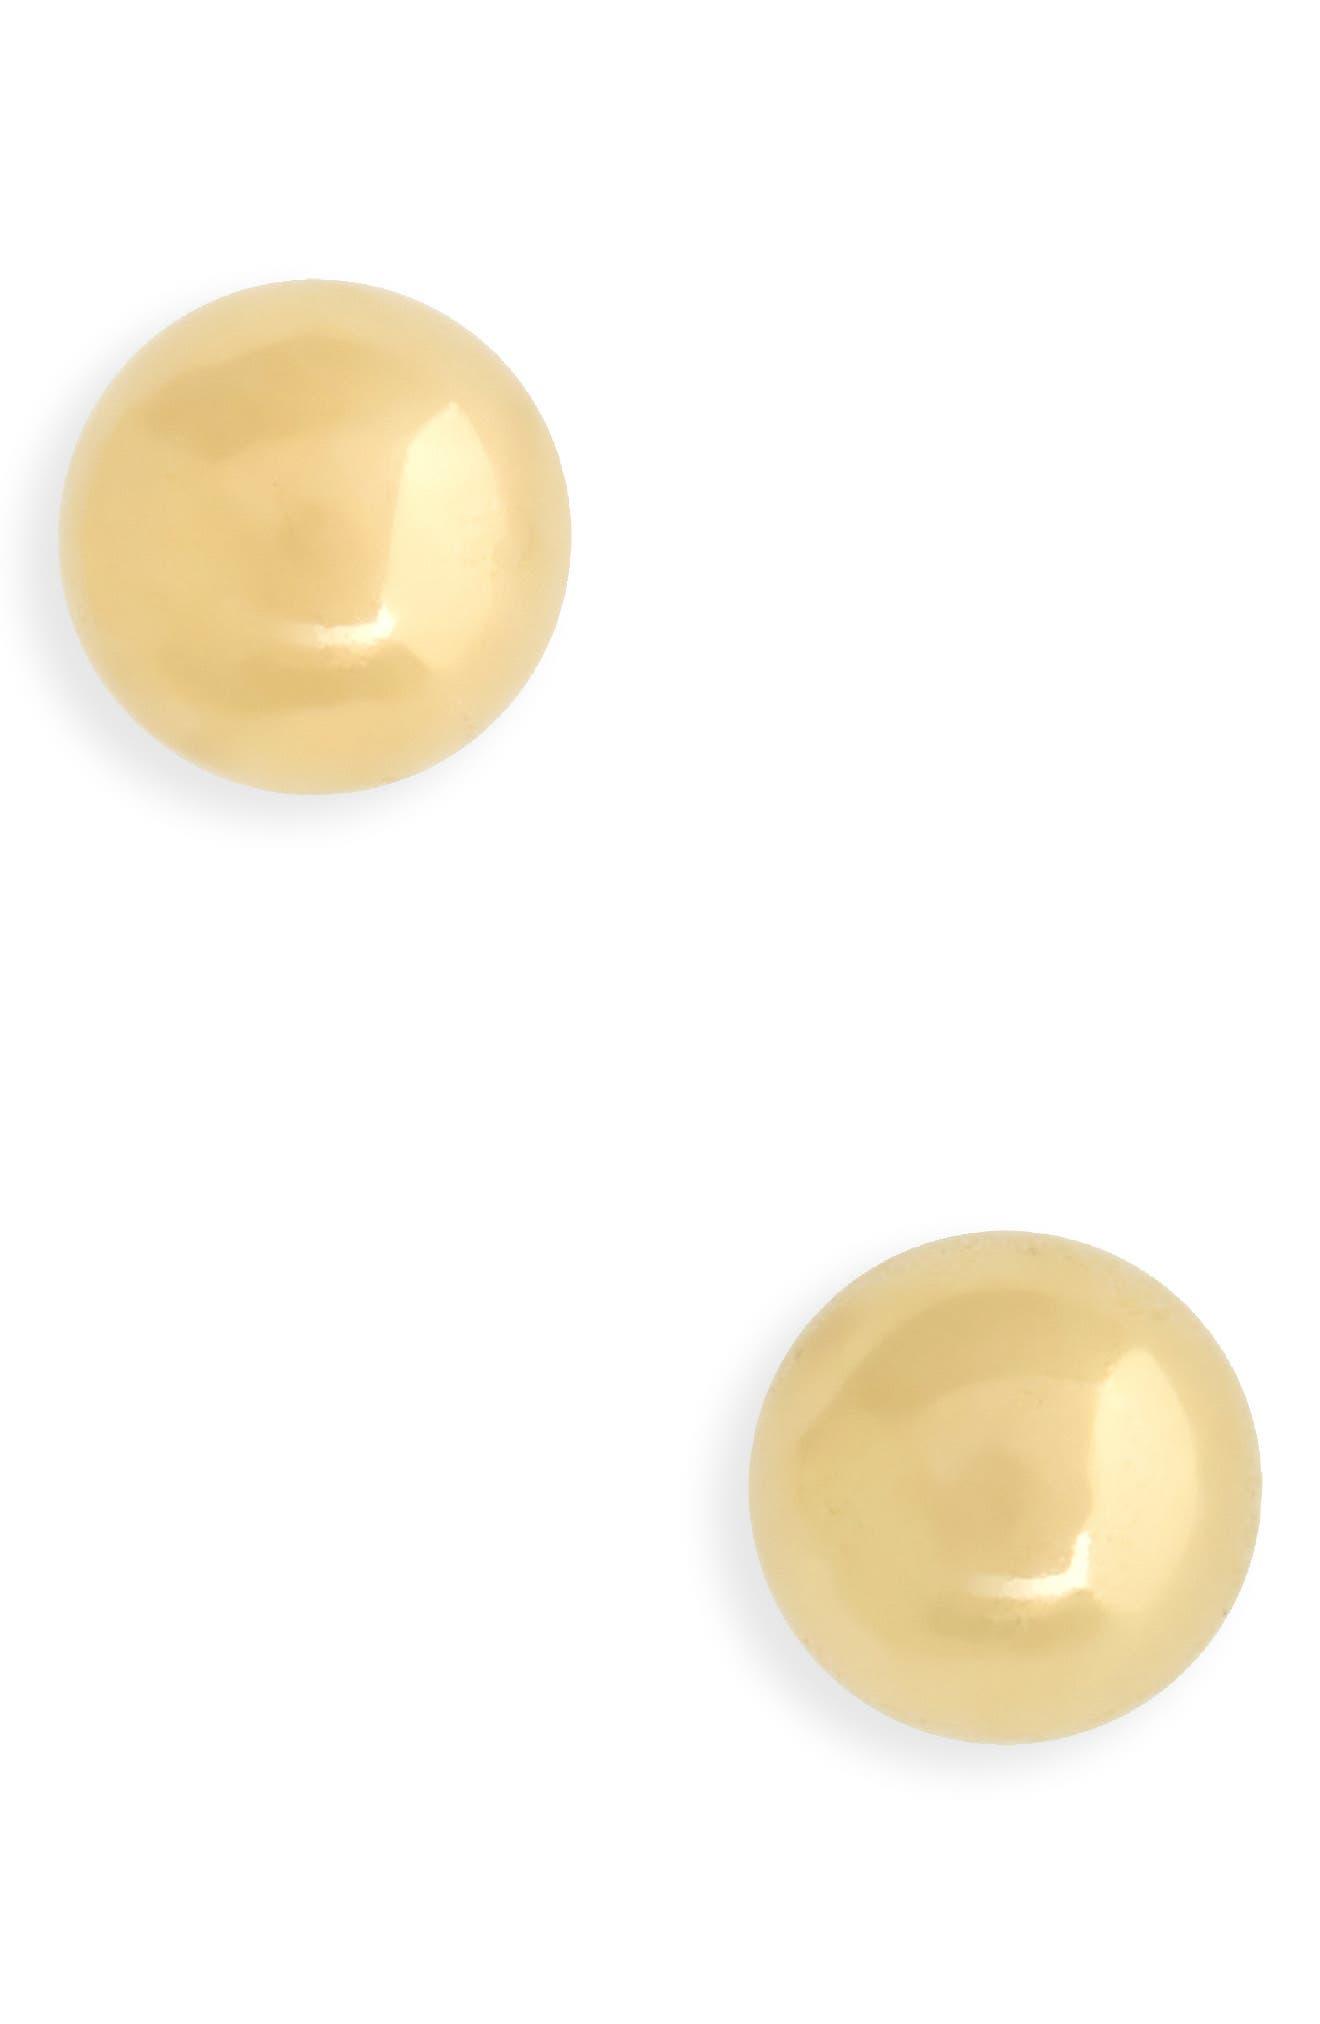 Kardee Kids 14k Gold Ball Earrings,                             Main thumbnail 1, color,                             GOLD